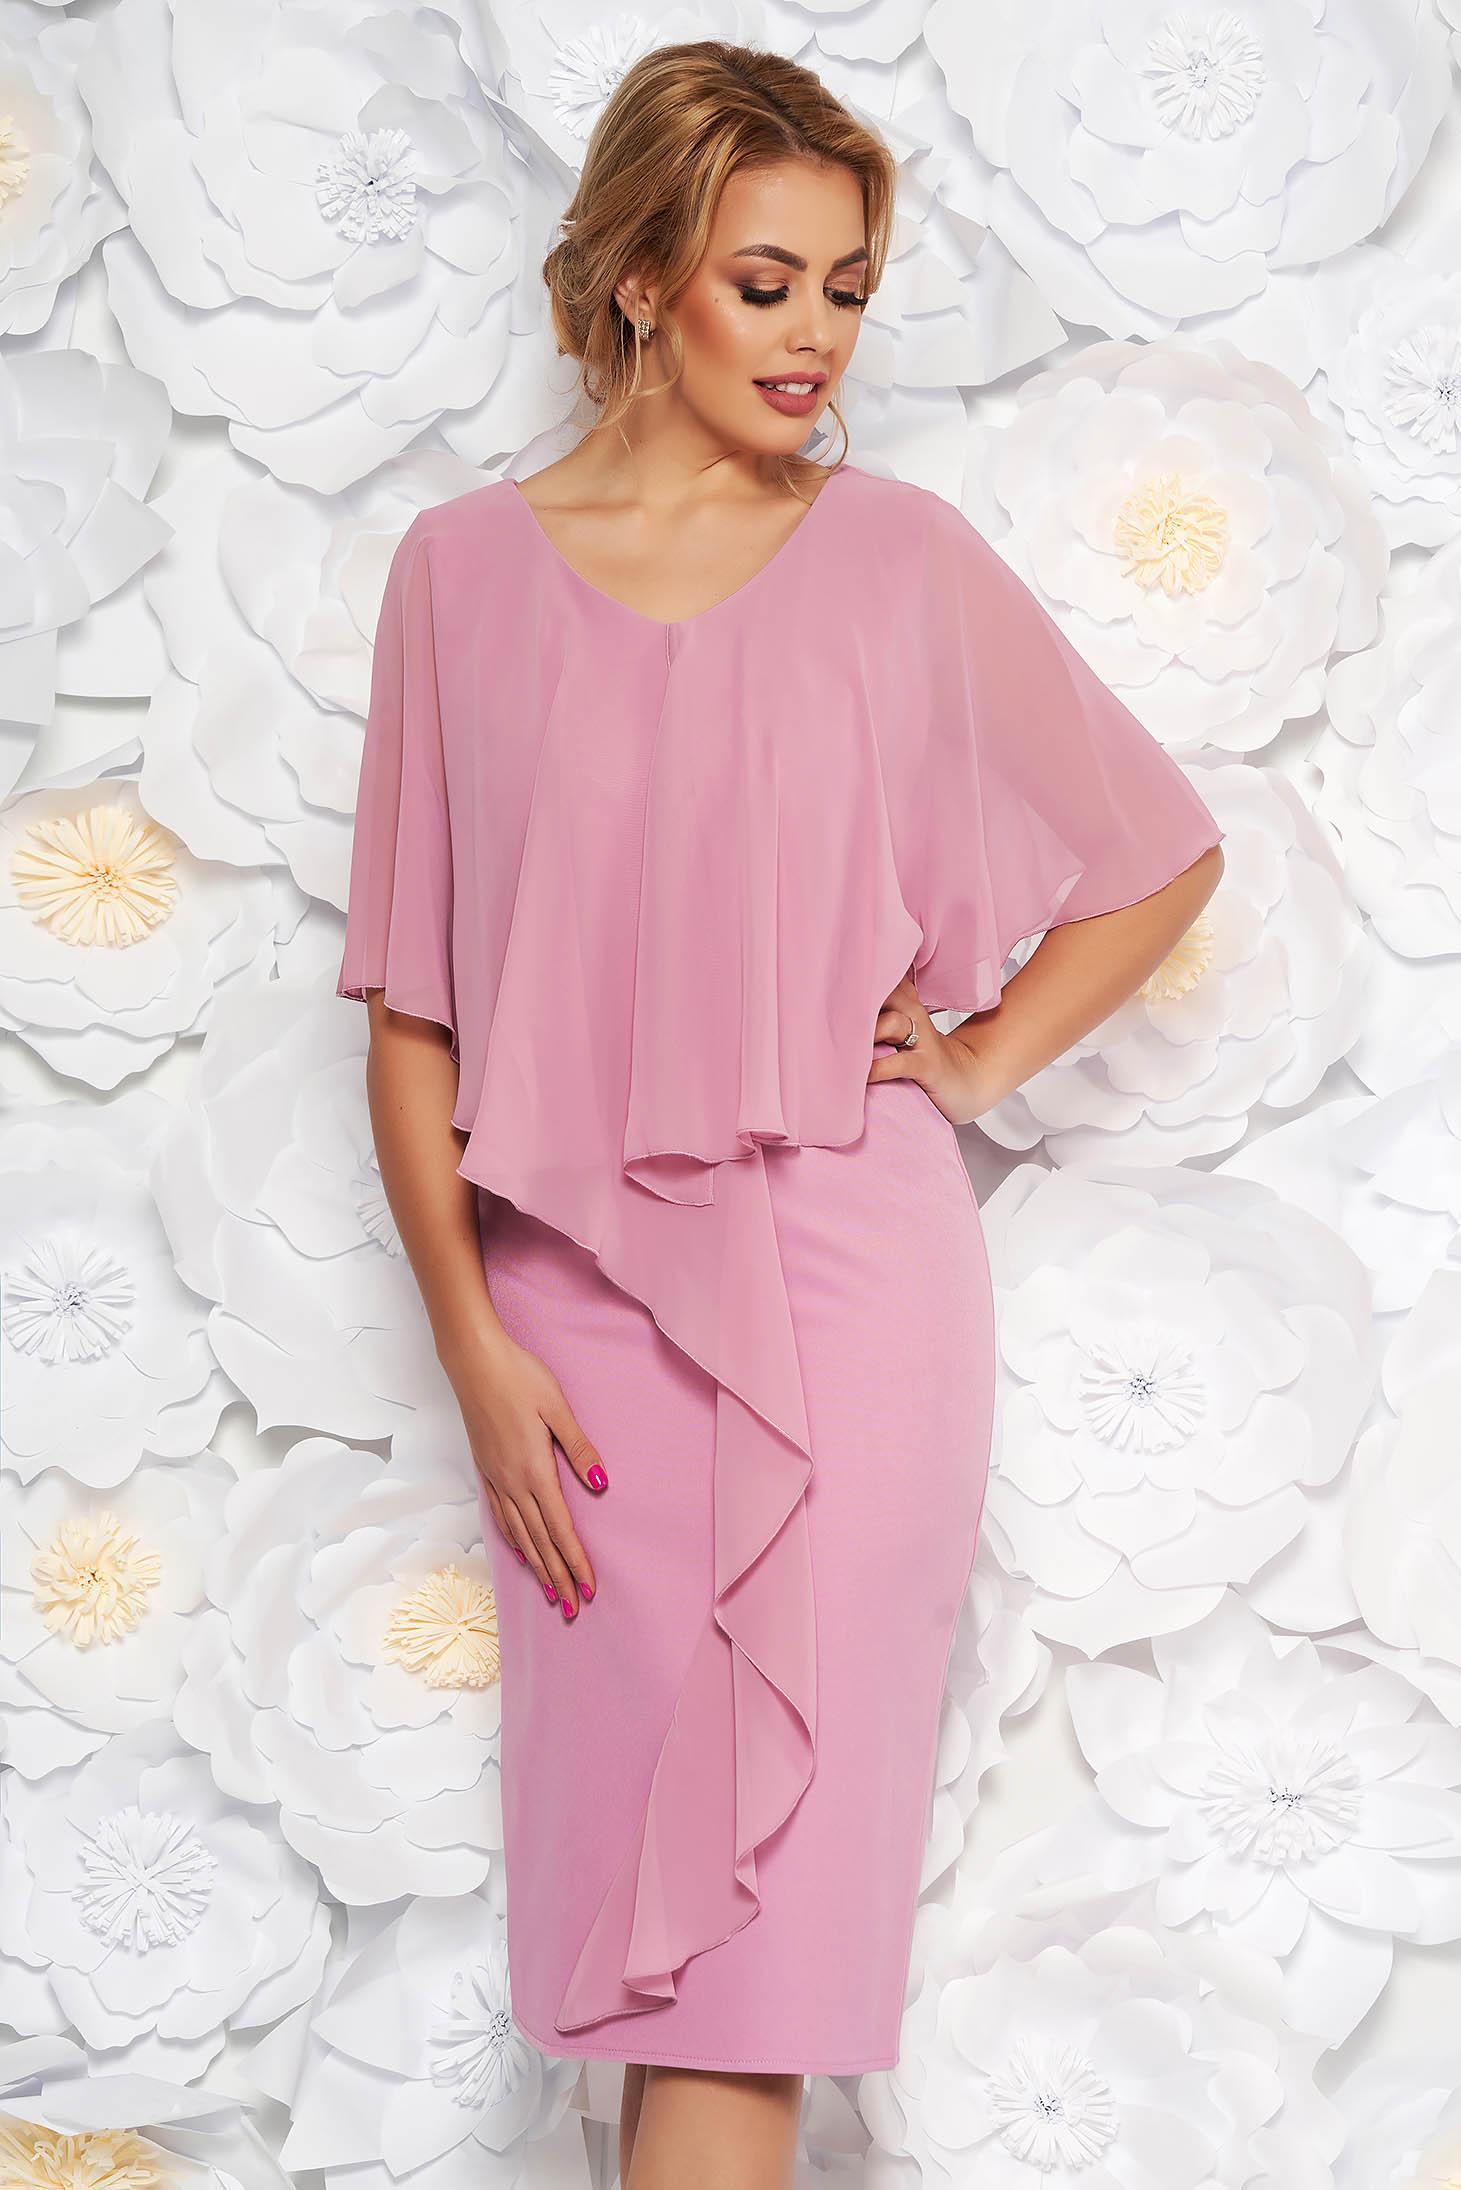 Rochie roz deschis de ocazie midi fara maneci cu un croi cambrat din stofa subtire usor elastica suprapunere cu voal